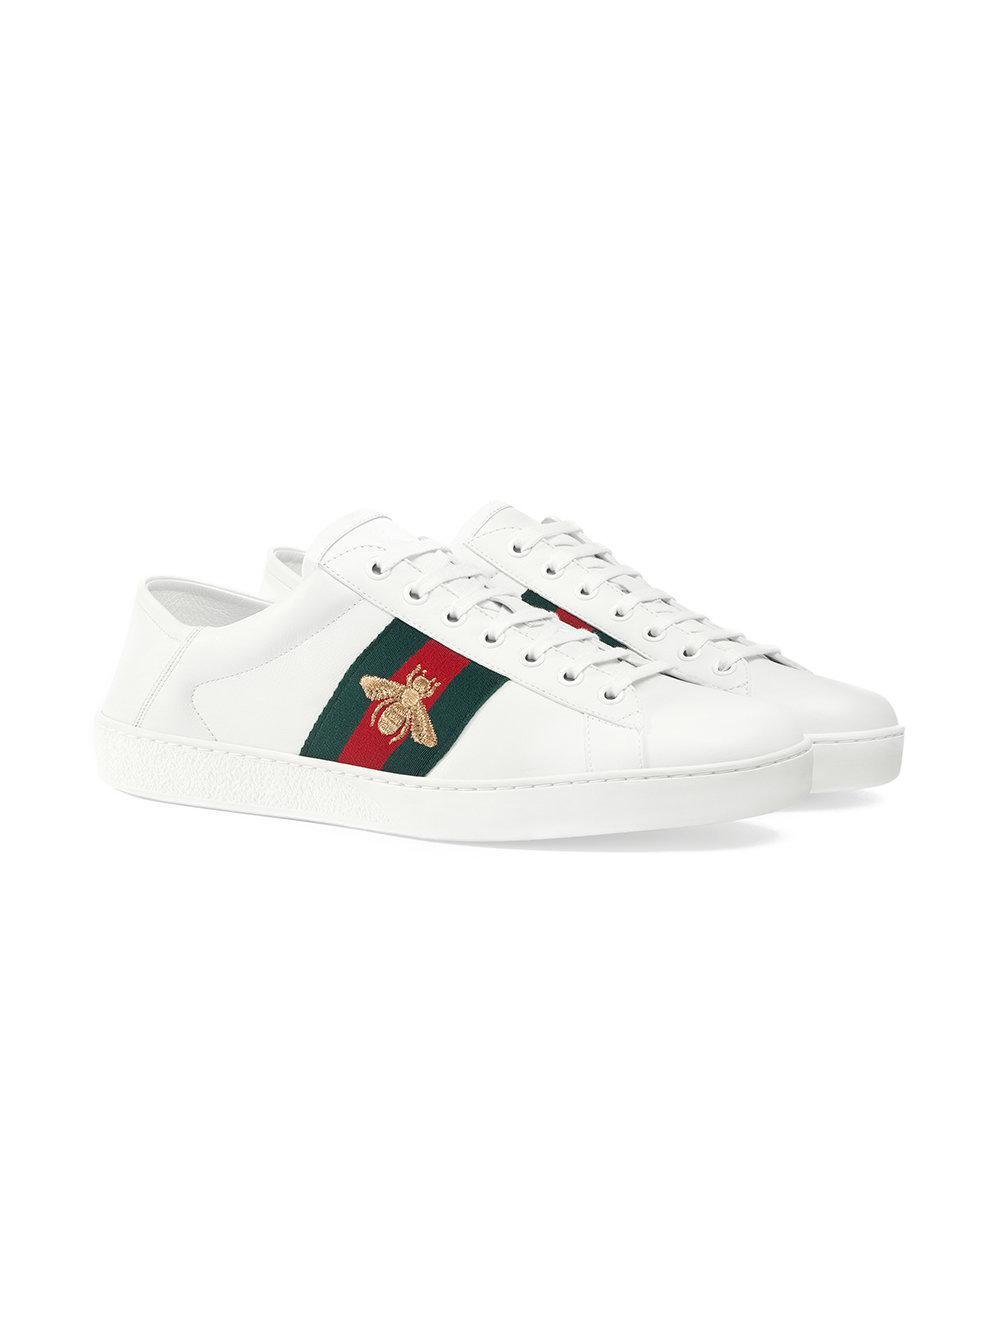 cd05b5e93 Gucci Ace Sneaker in White for Men - Lyst